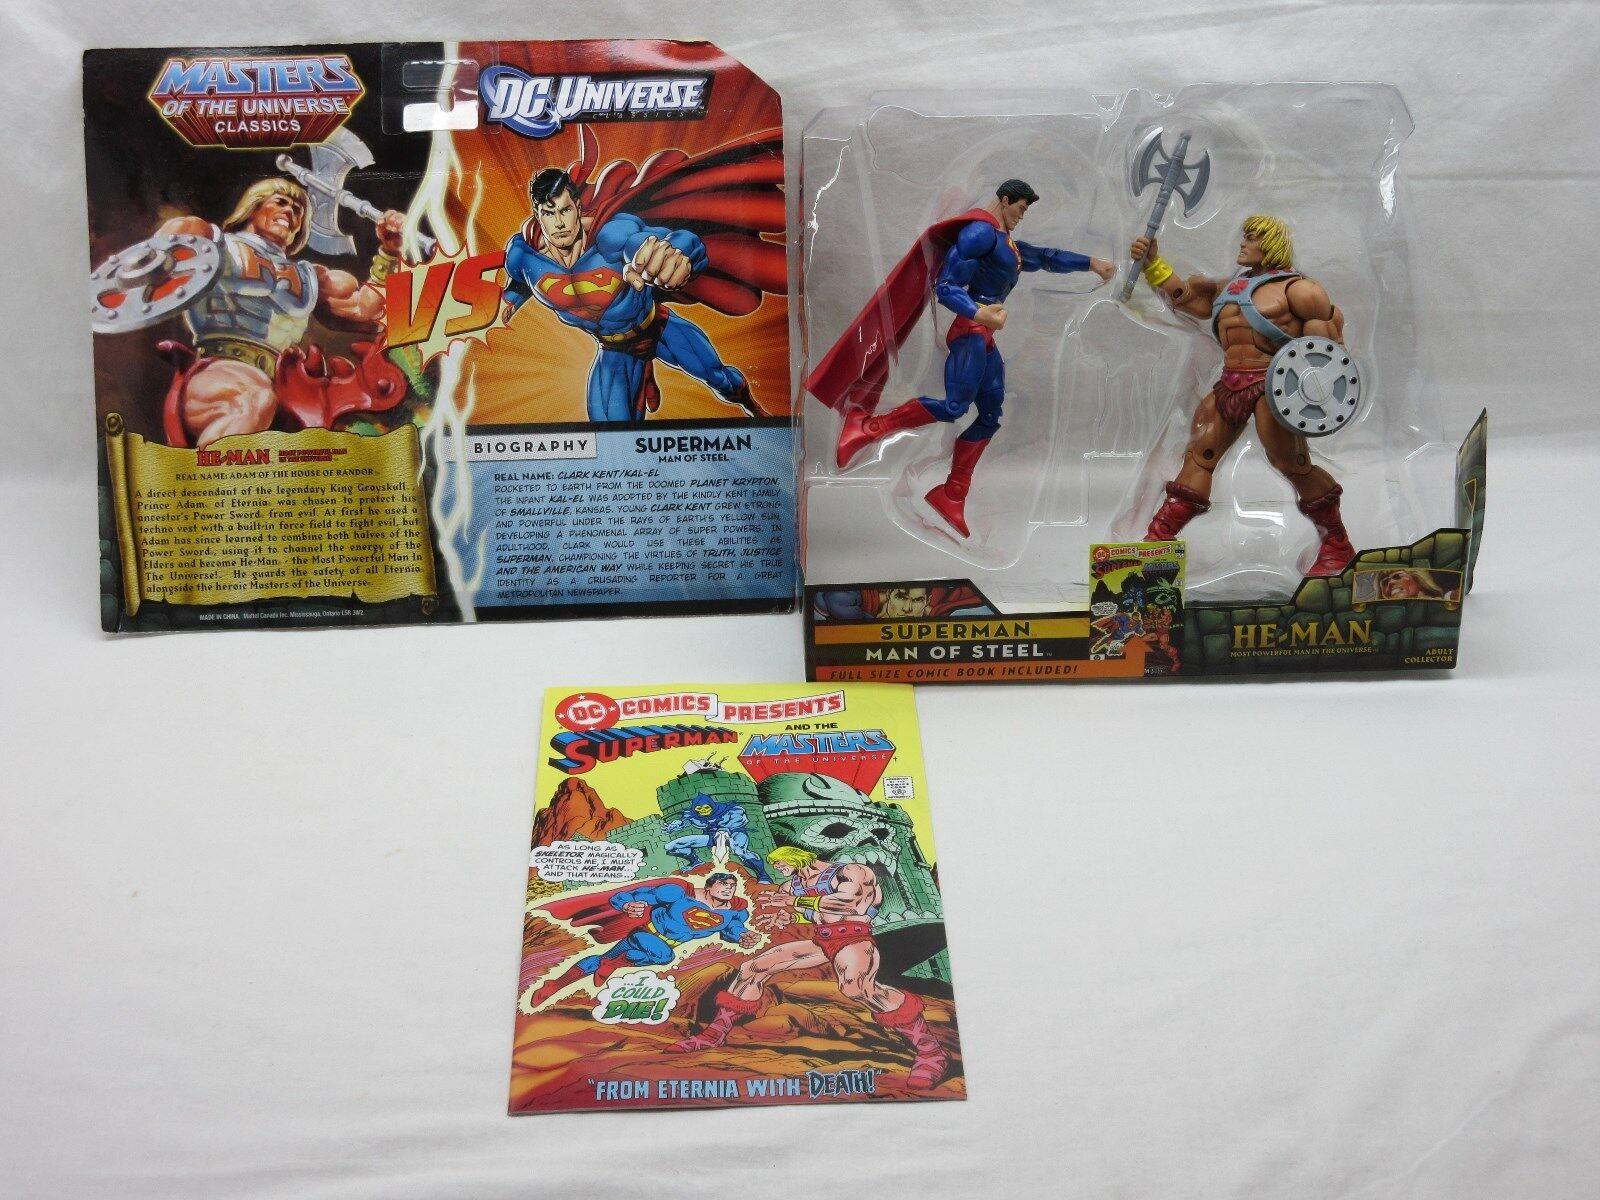 MOTU,MOTUC,He-Man vs Superman,MINT,DC Universe,figures,Masters Of the Universe